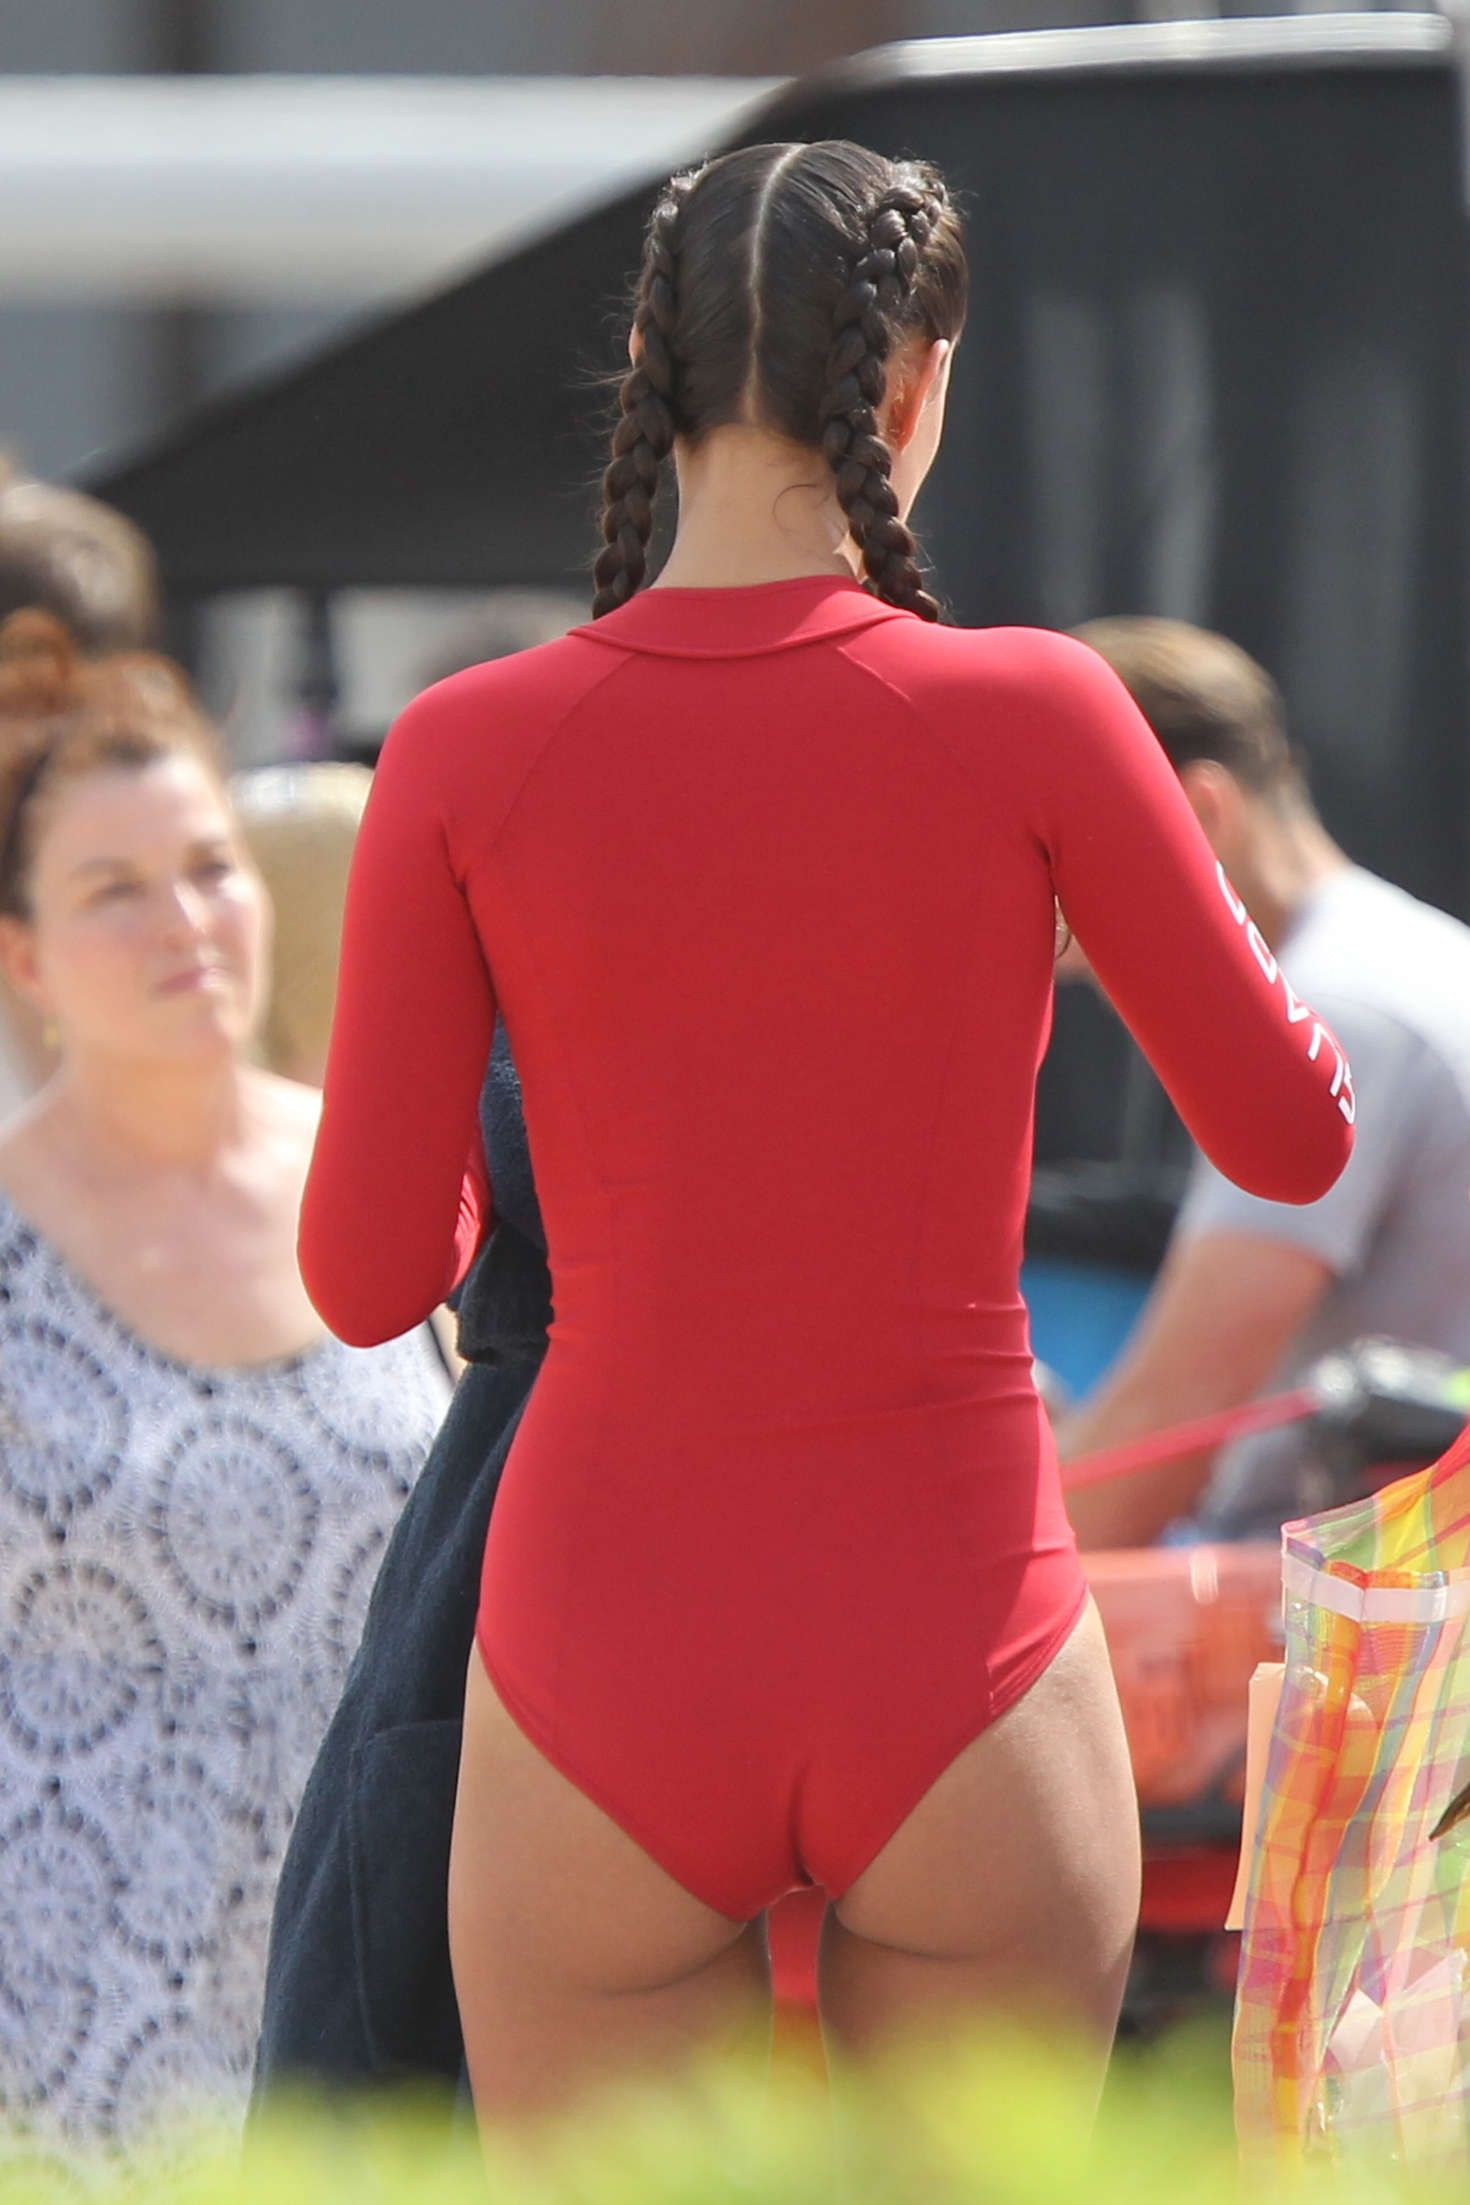 Ilfenesh-Hadera-in-a-Swimsuit9